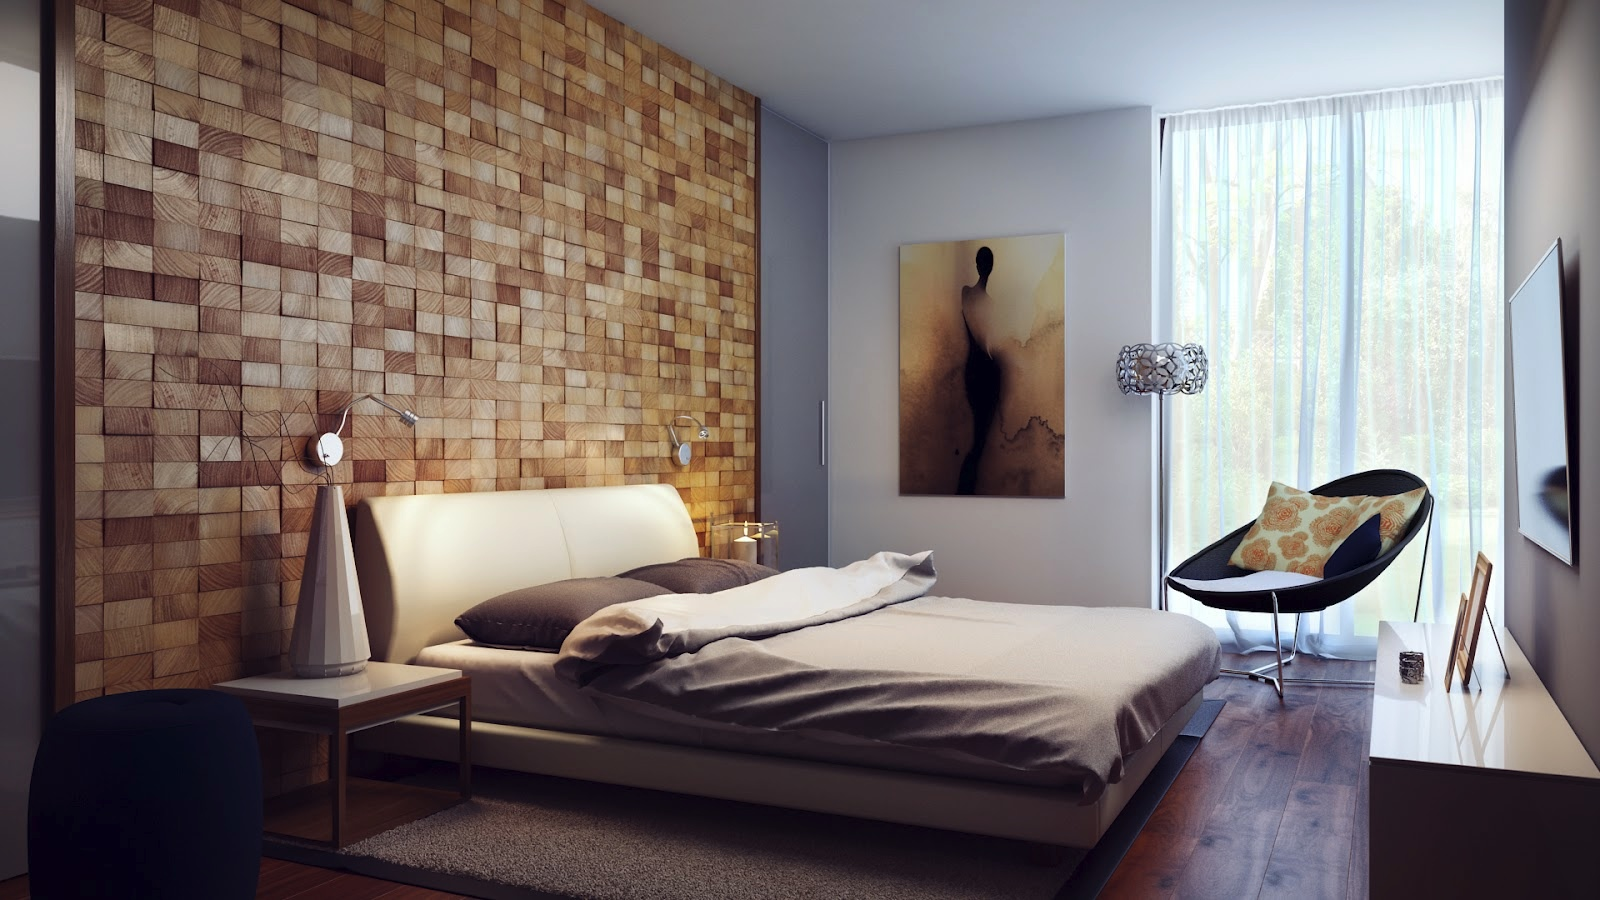 Contemporary Wood Block Headboard Wall Design liftupthyneighborcom 1600x900